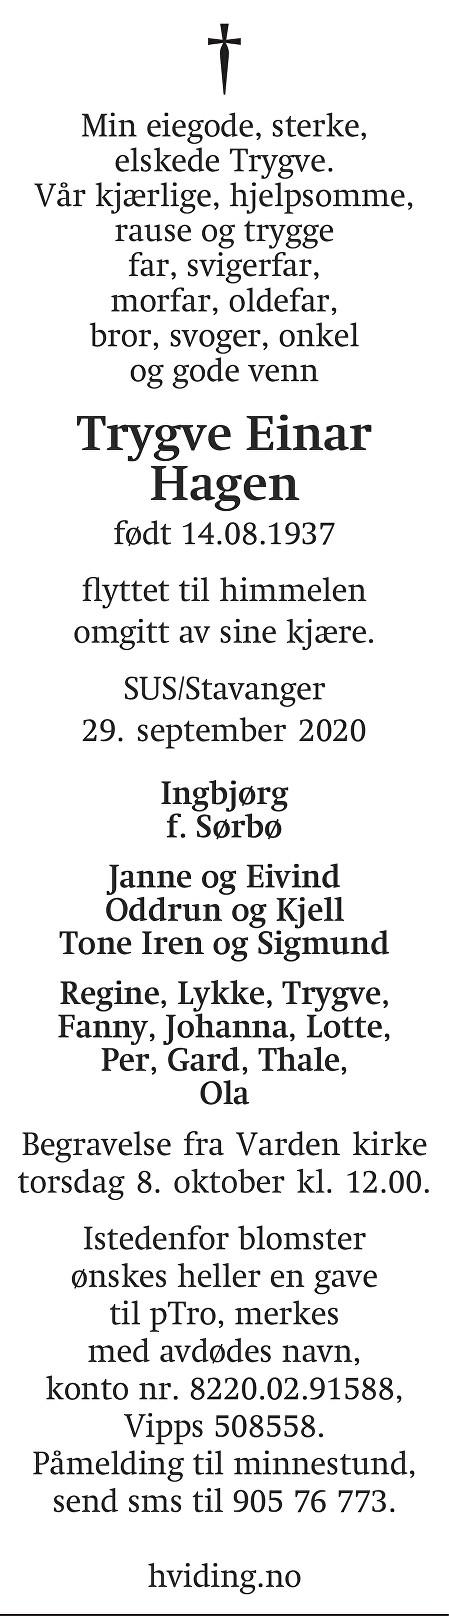 Trygve Einar Hagen Dødsannonse